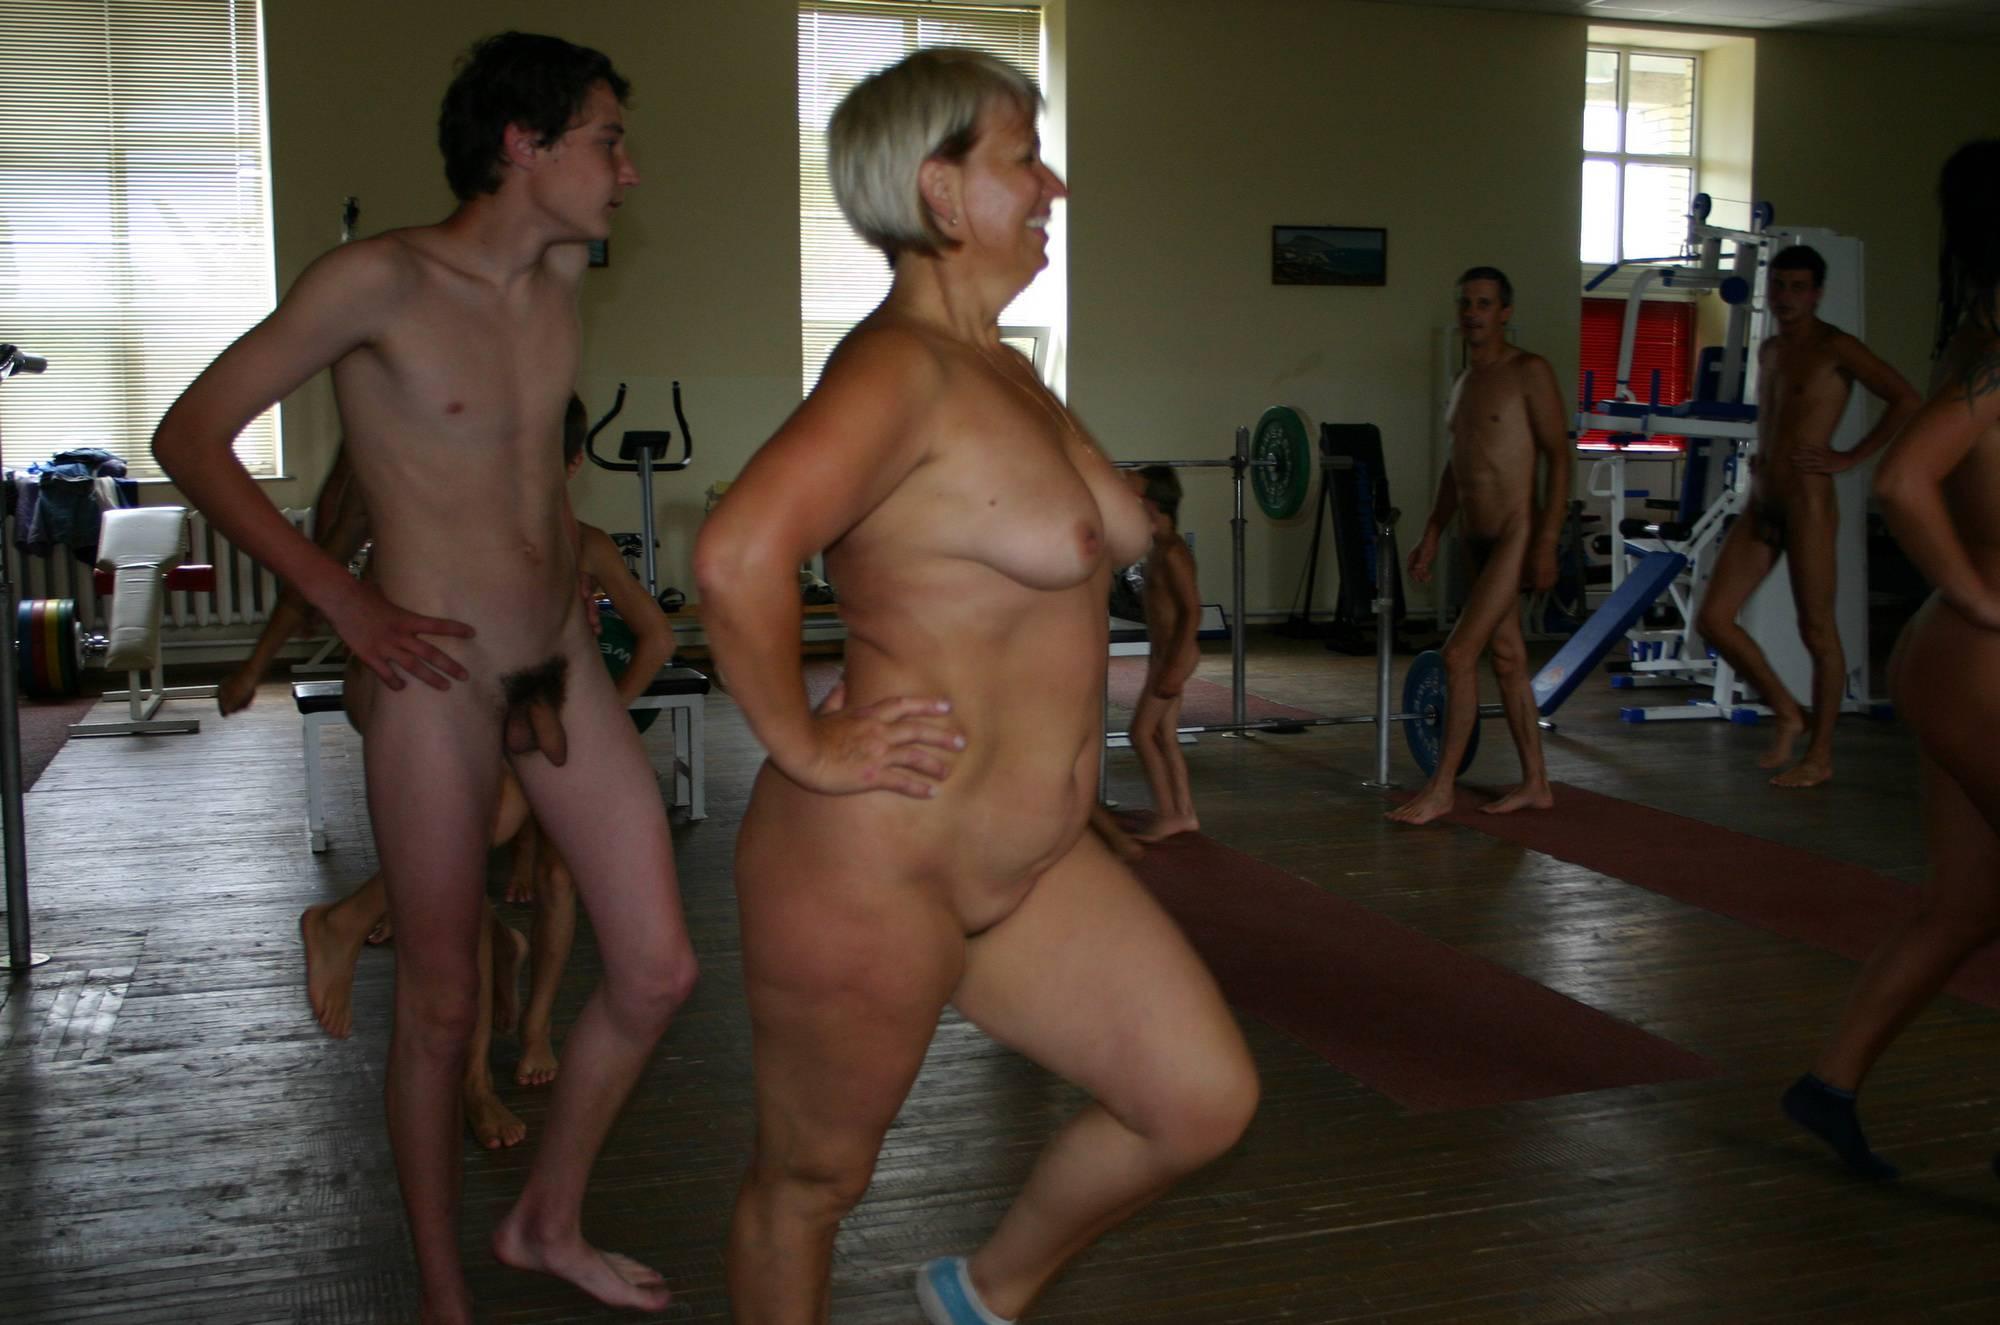 Family Gym Naturist Train - 2